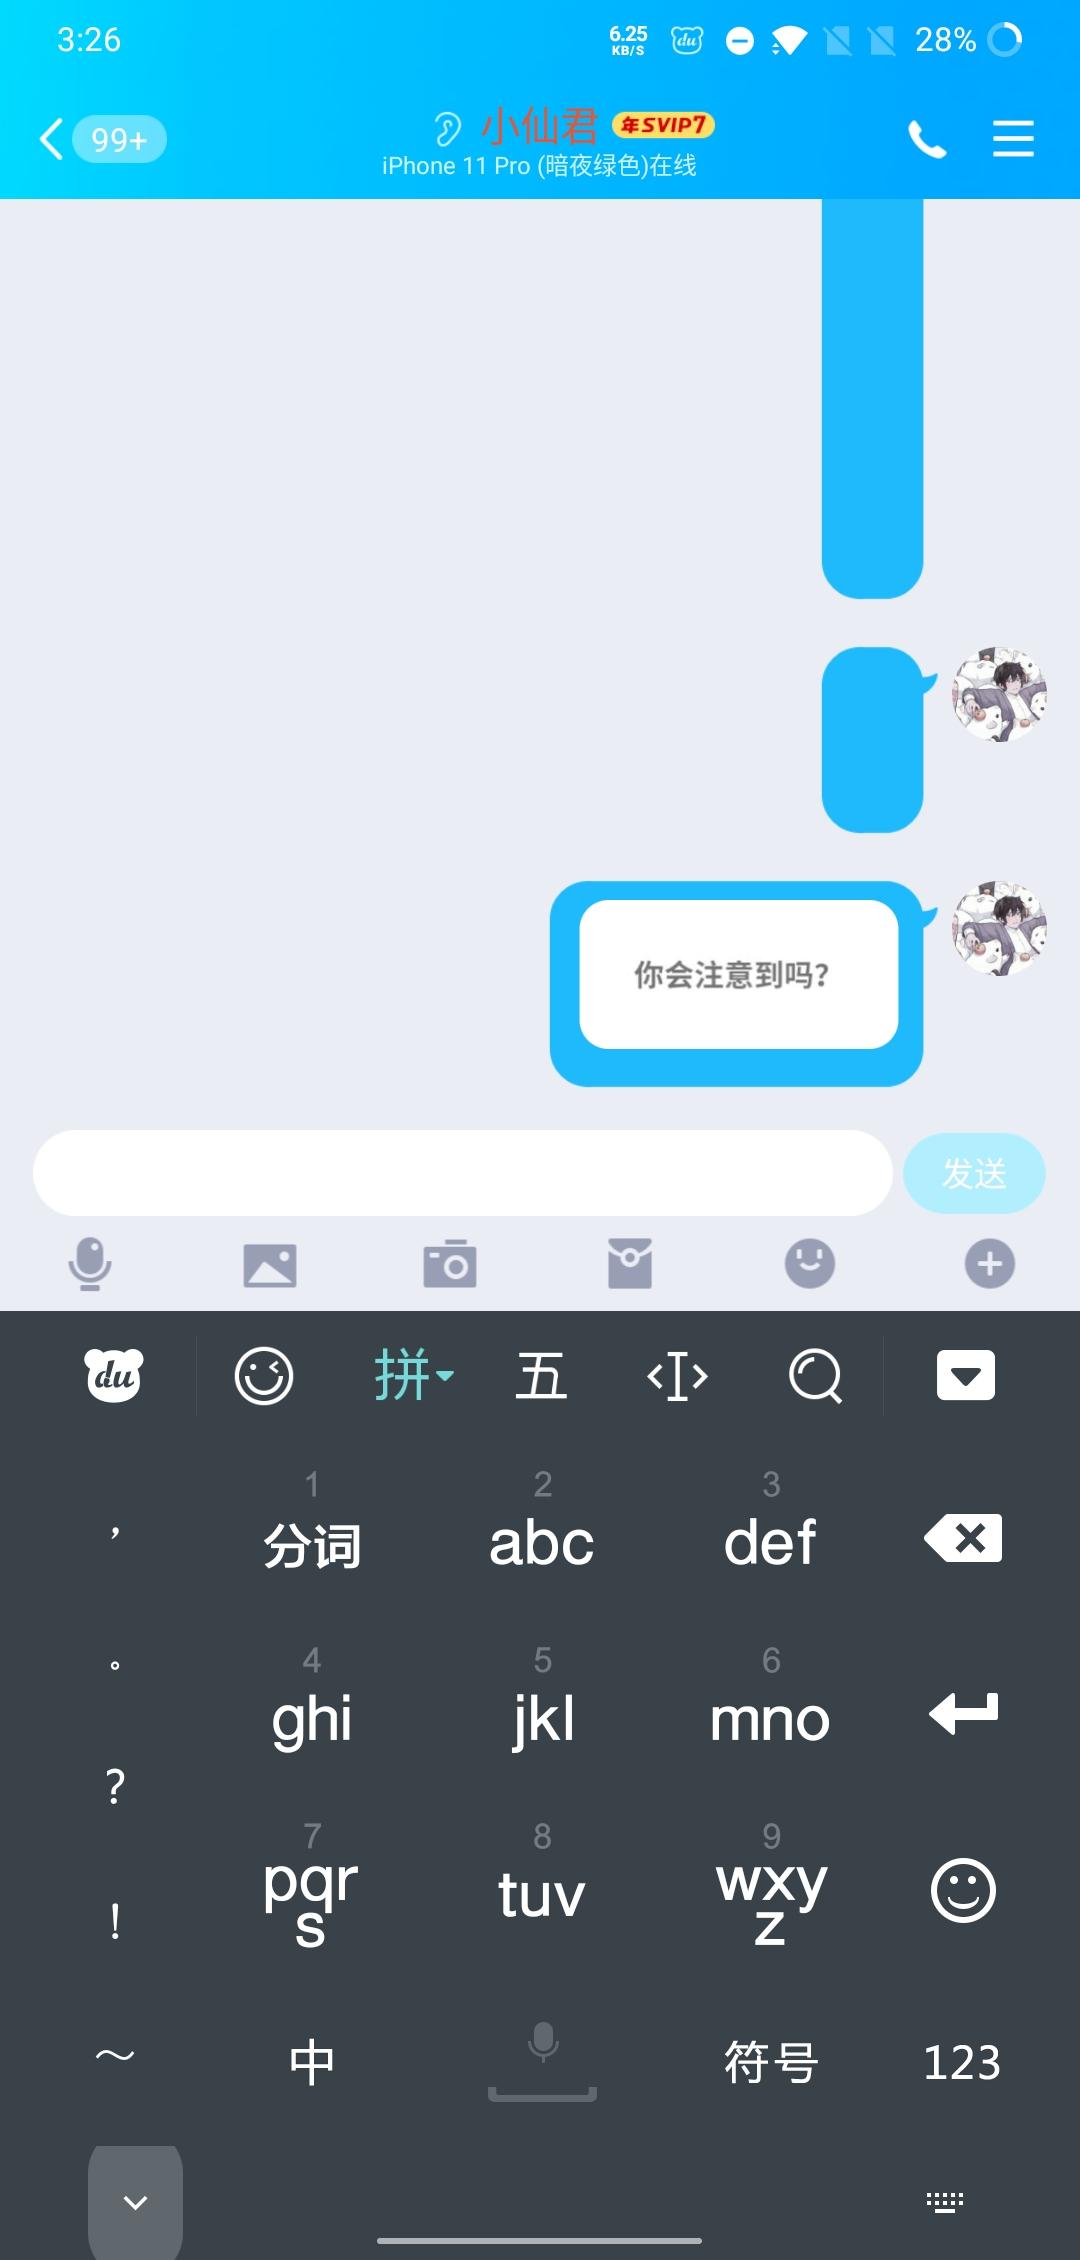 【原创工具】QQ隐藏文字图生成Android1.0